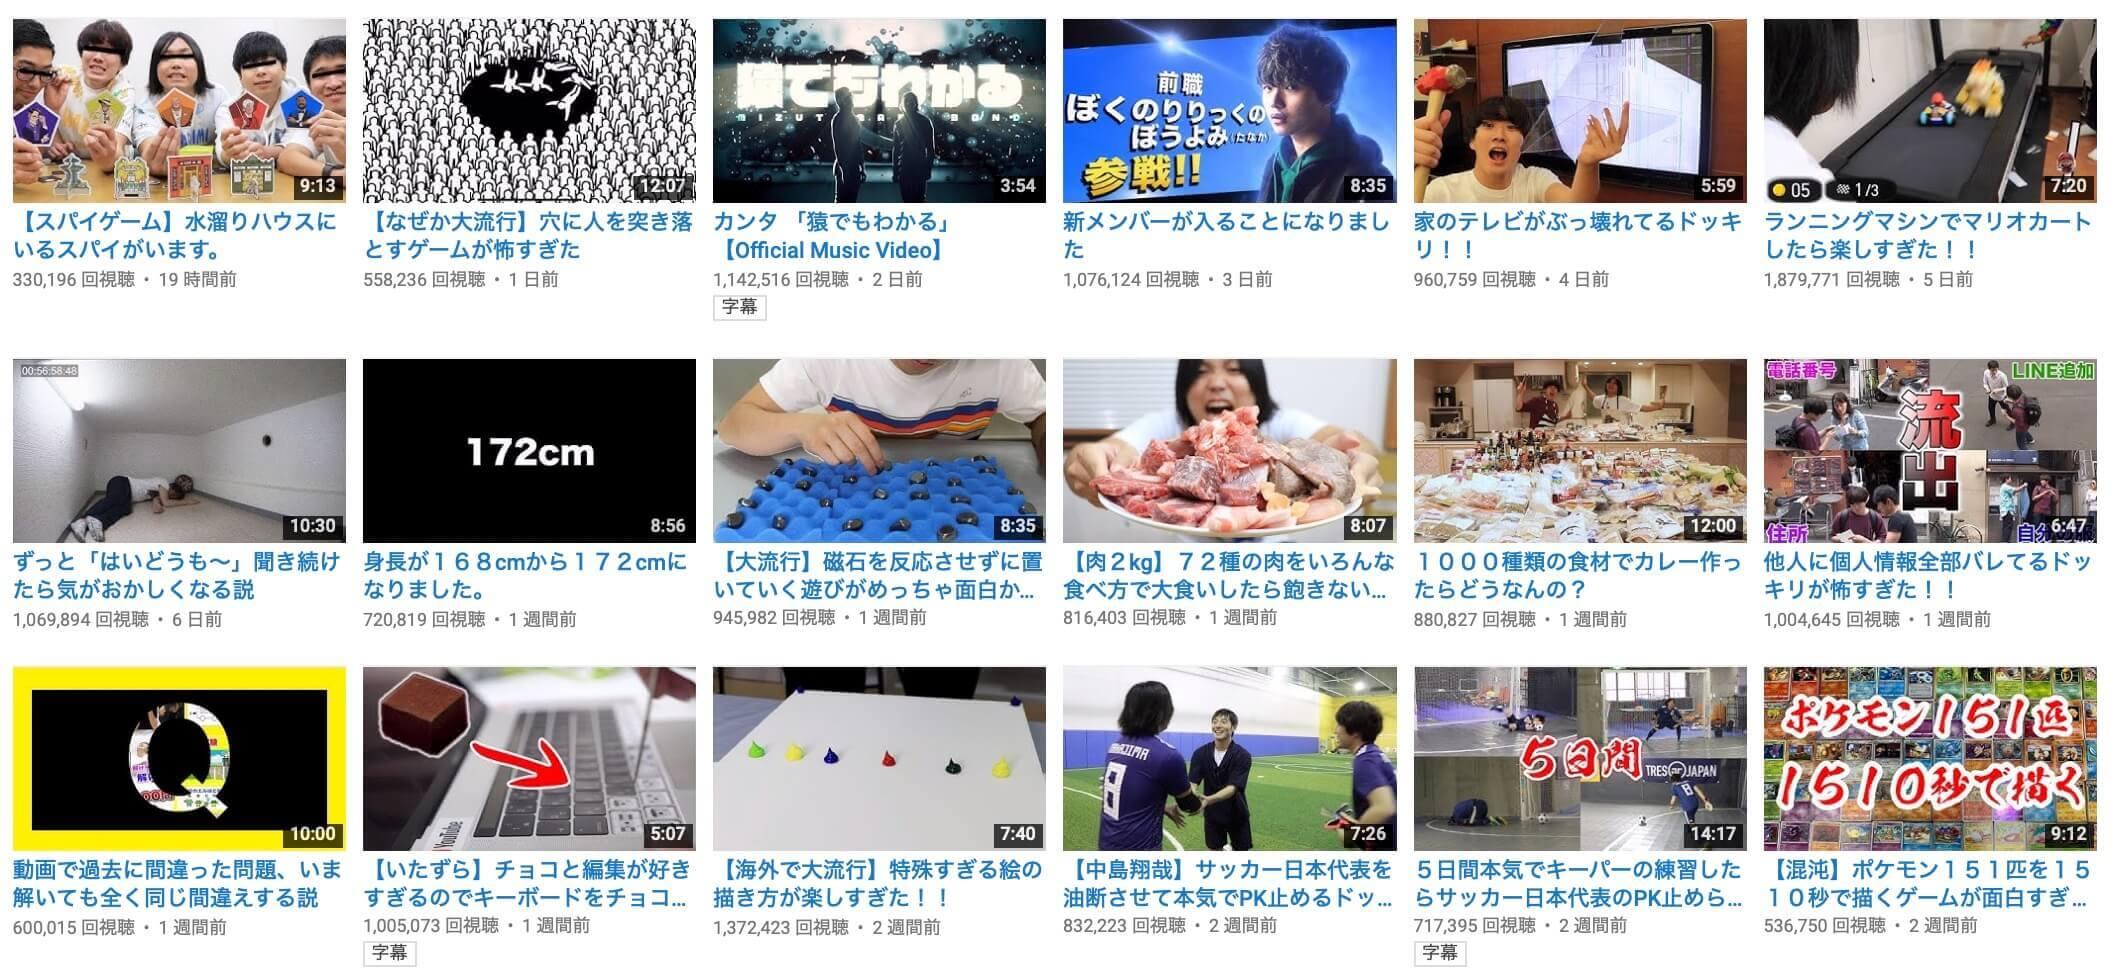 Youtubeの動画一覧